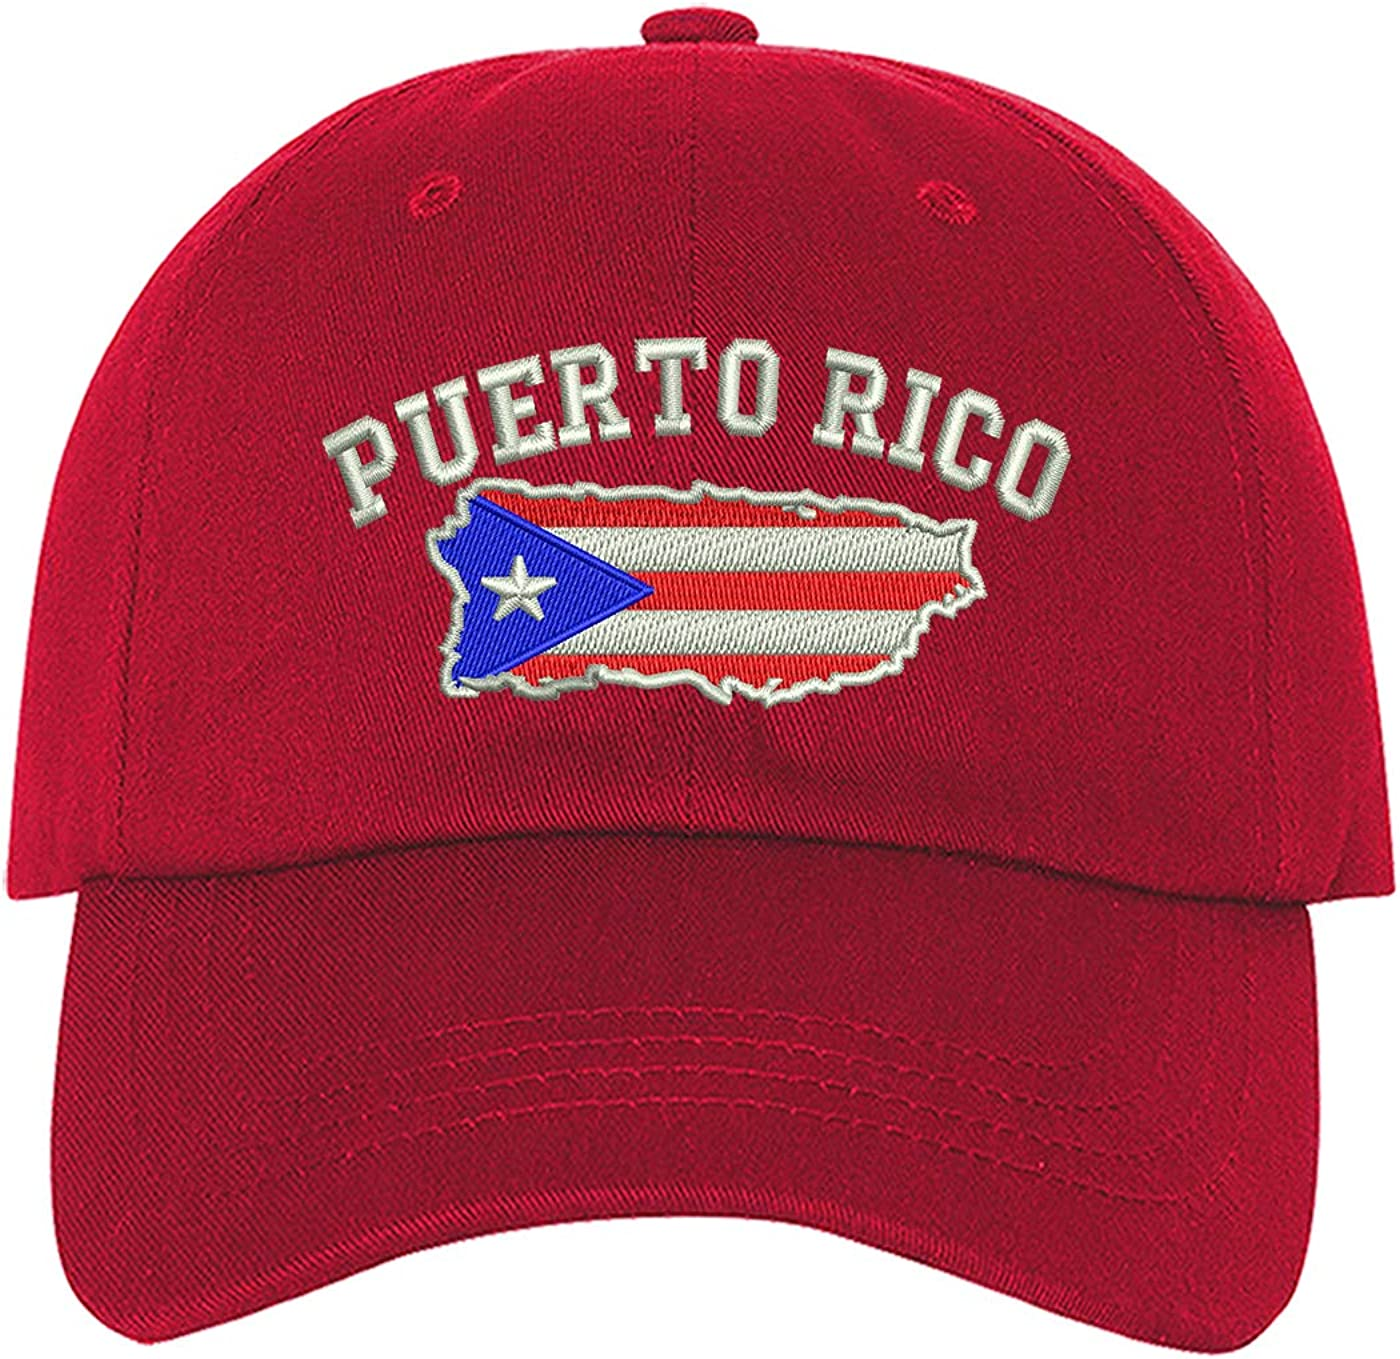 DSY Lifestyle Puerto Rico Map Baseball Cap - Boricua Baseball Hat Dad Hat Unisex